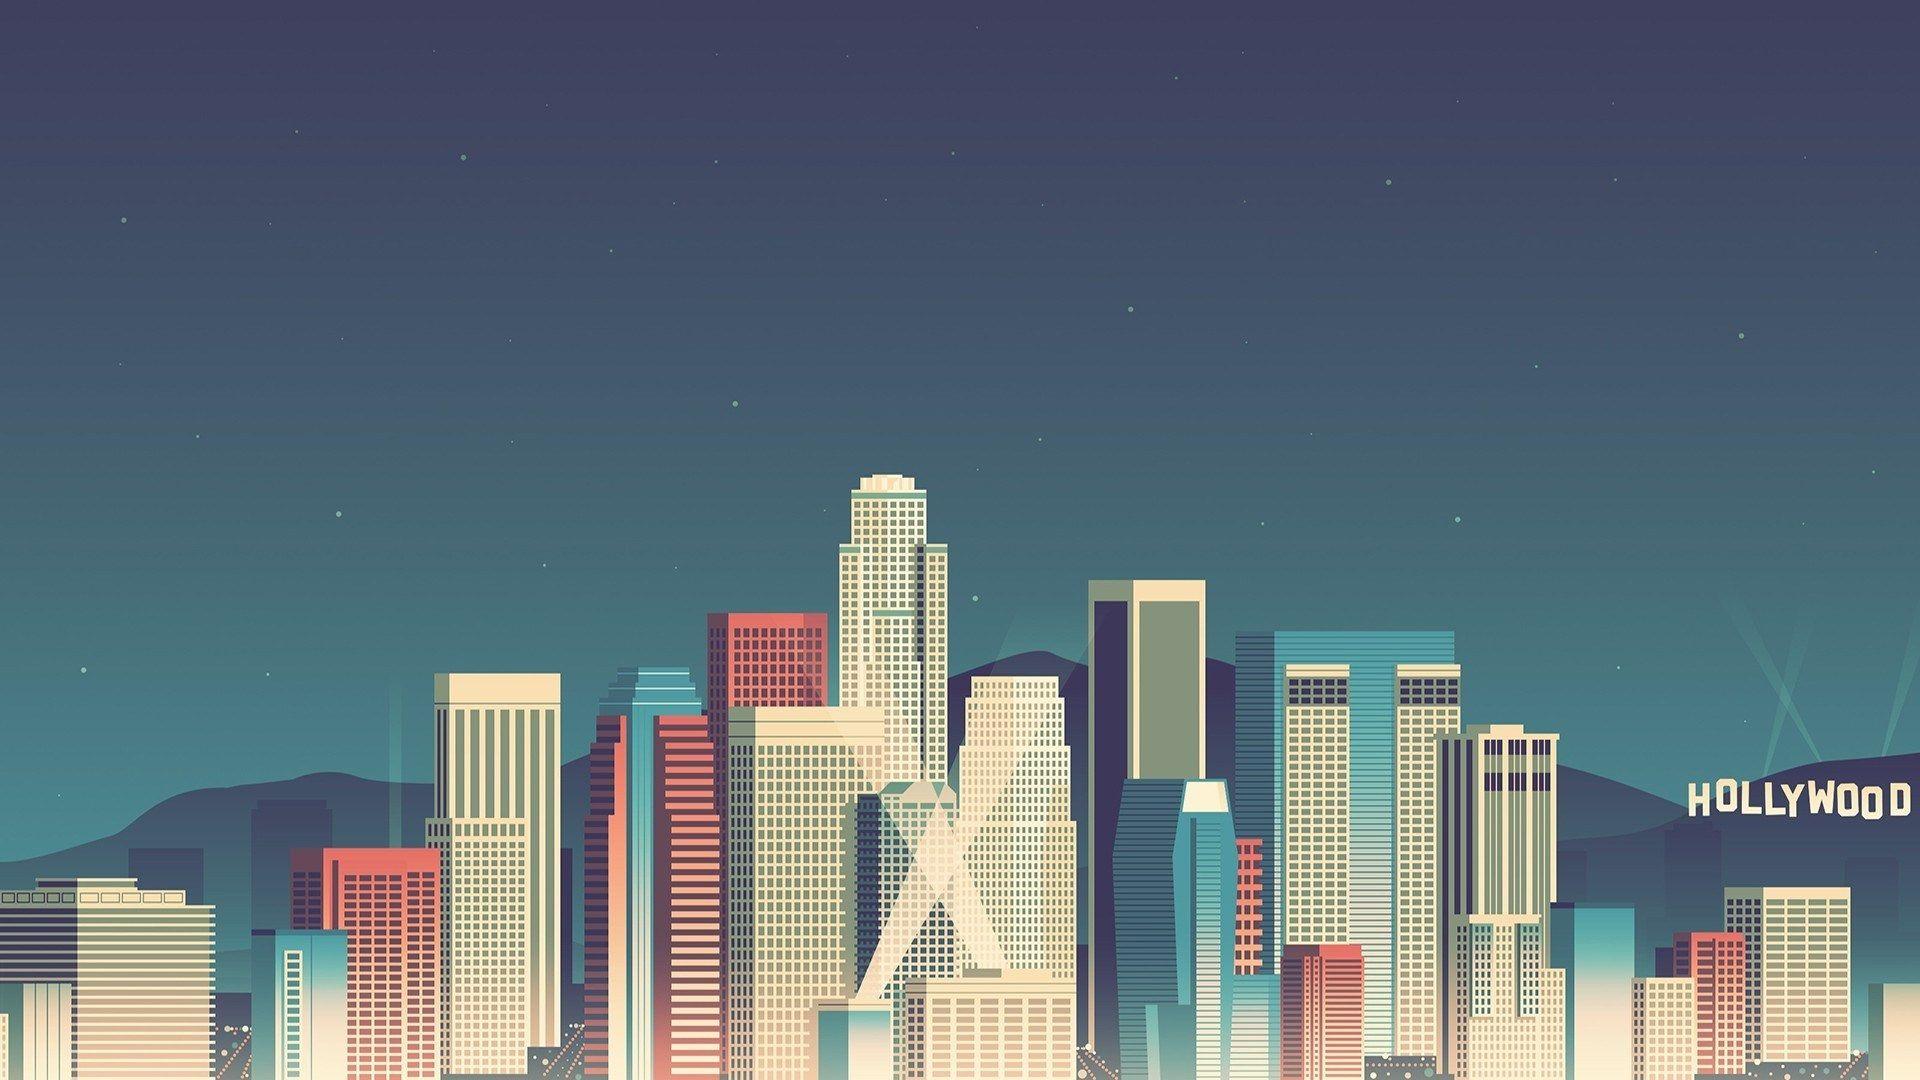 1920x1080 skycrapper wallpaper for desktop background